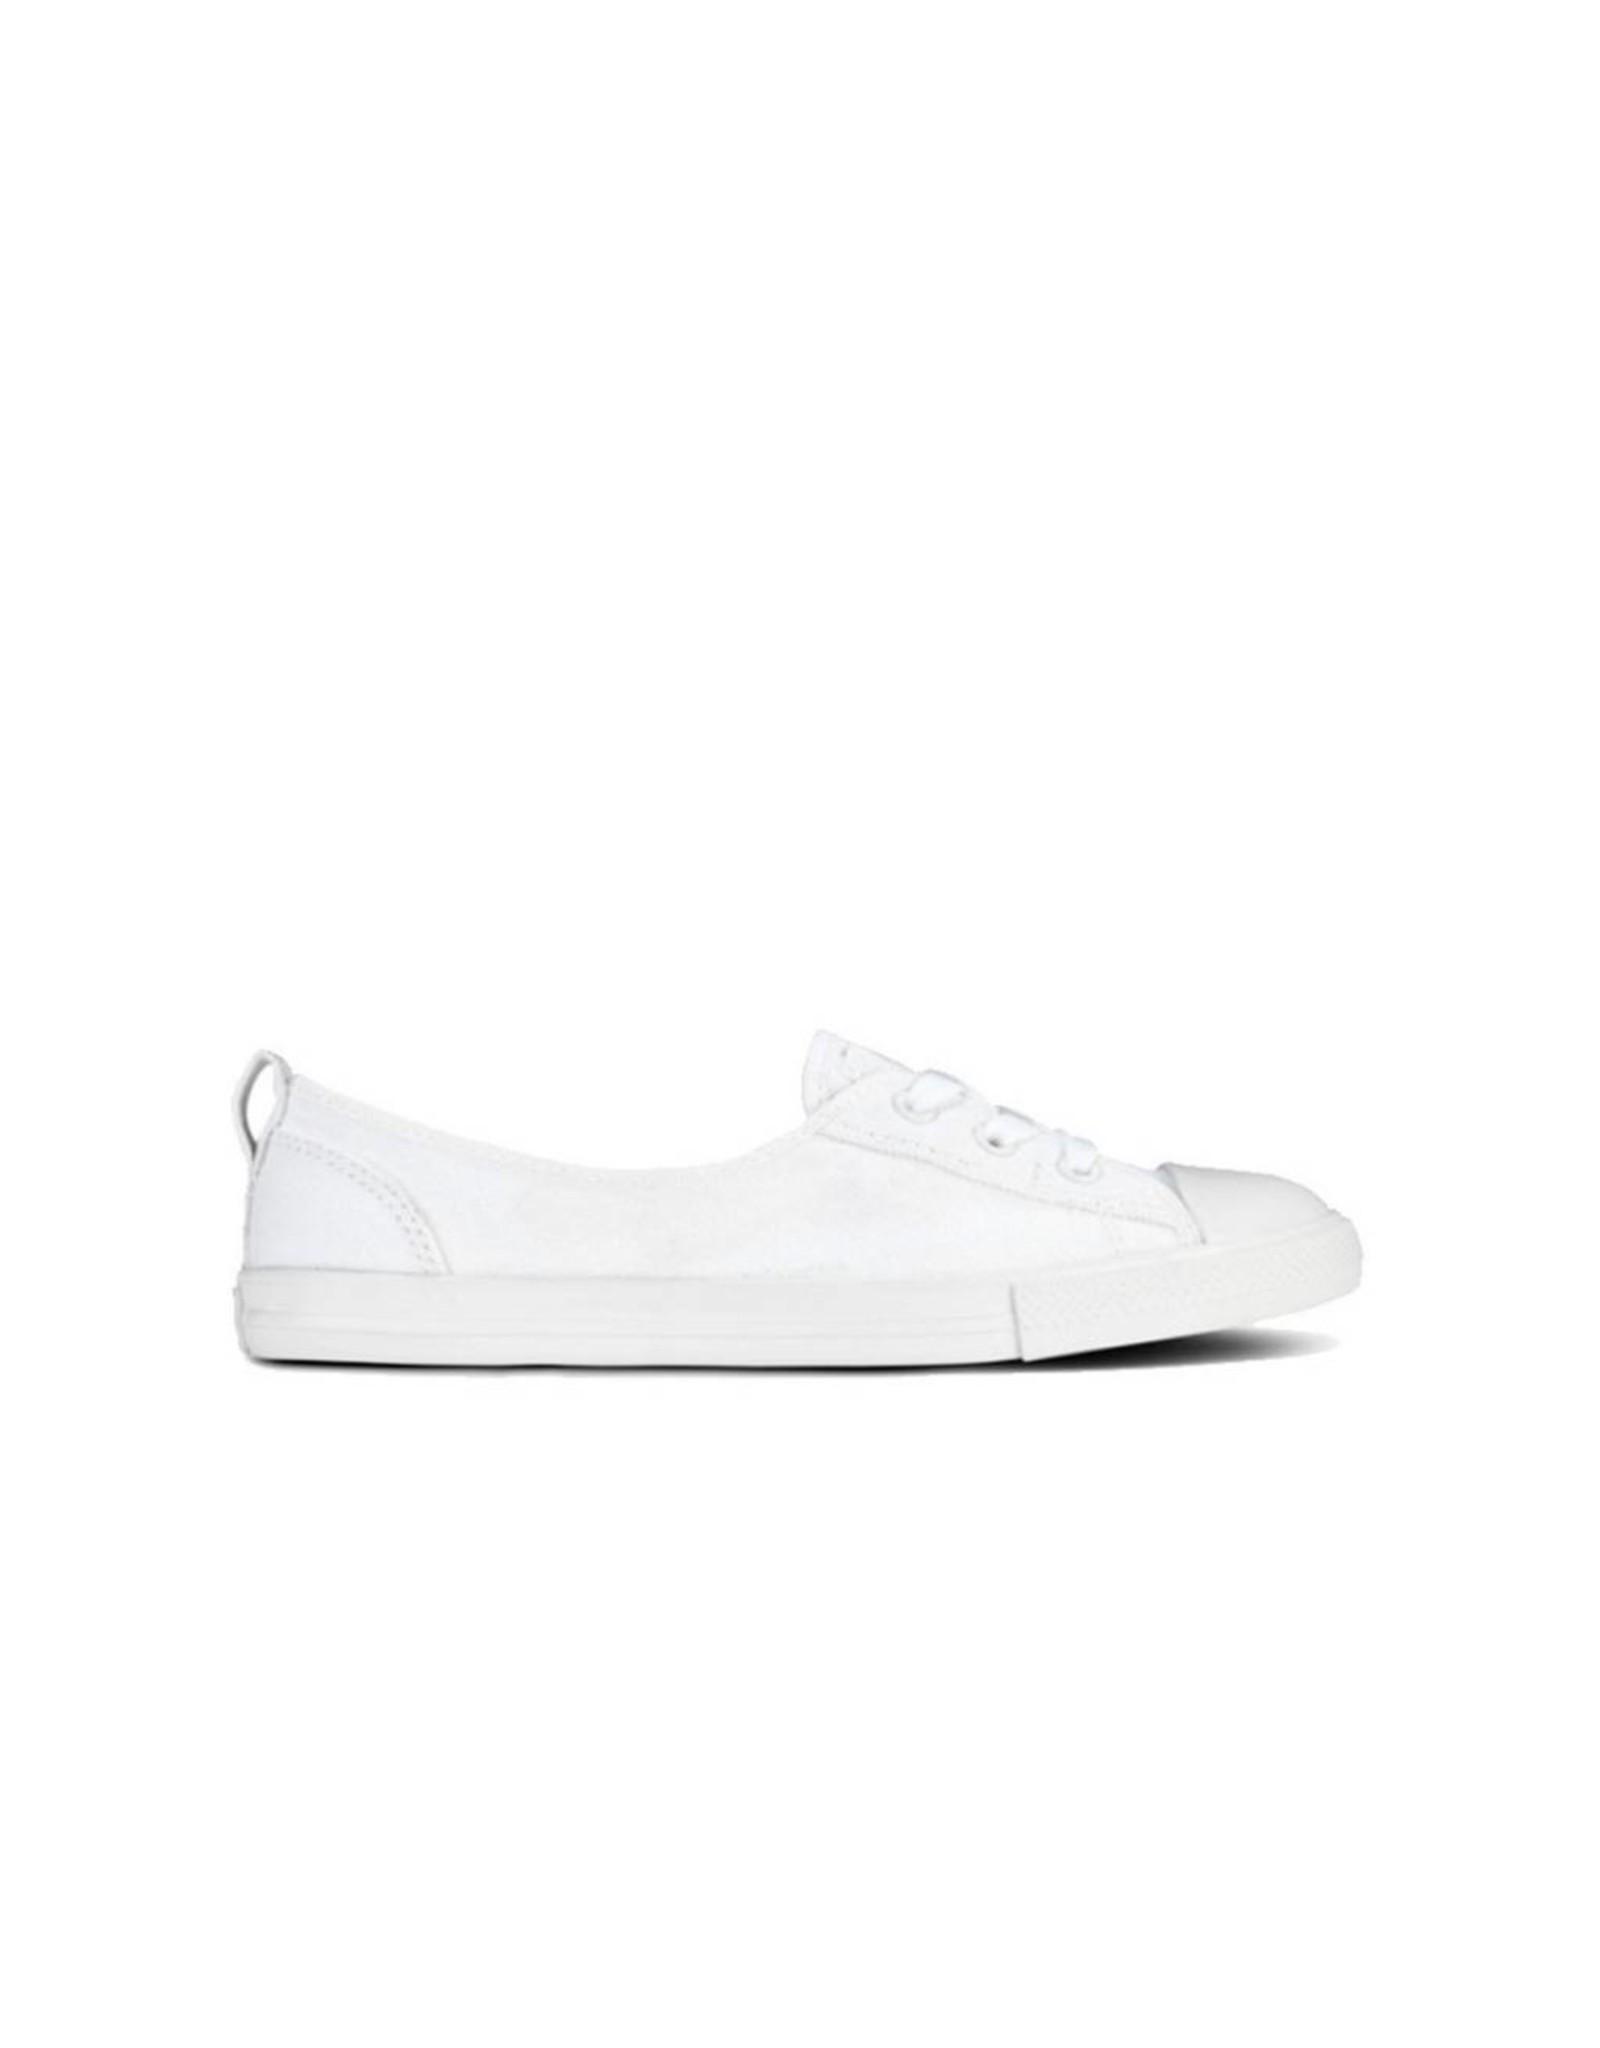 converse chuck taylor ballet lace white